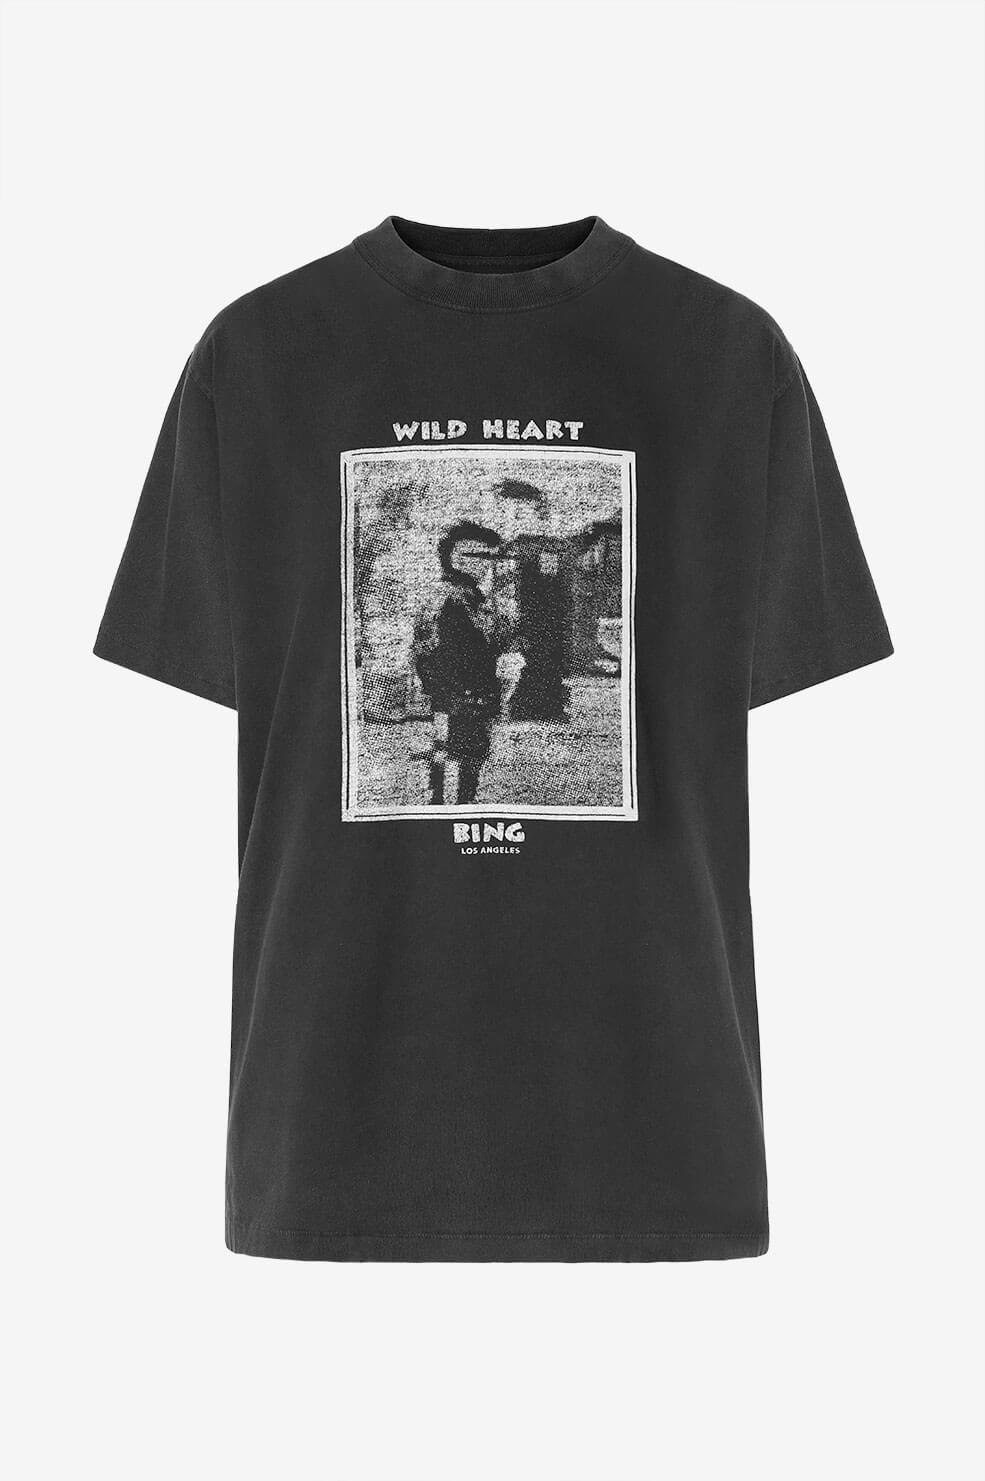 ANINE BING t-shirt mohawk-1